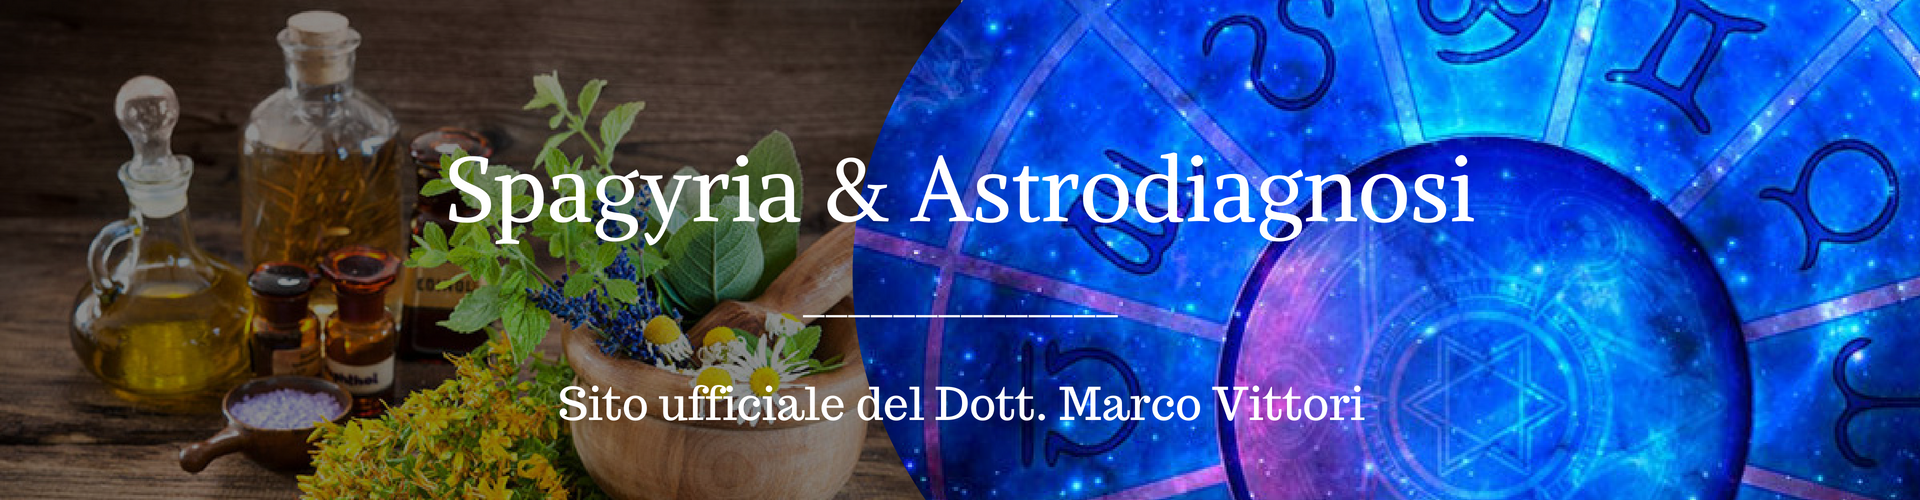 Spagyria & Astrodiagnosi